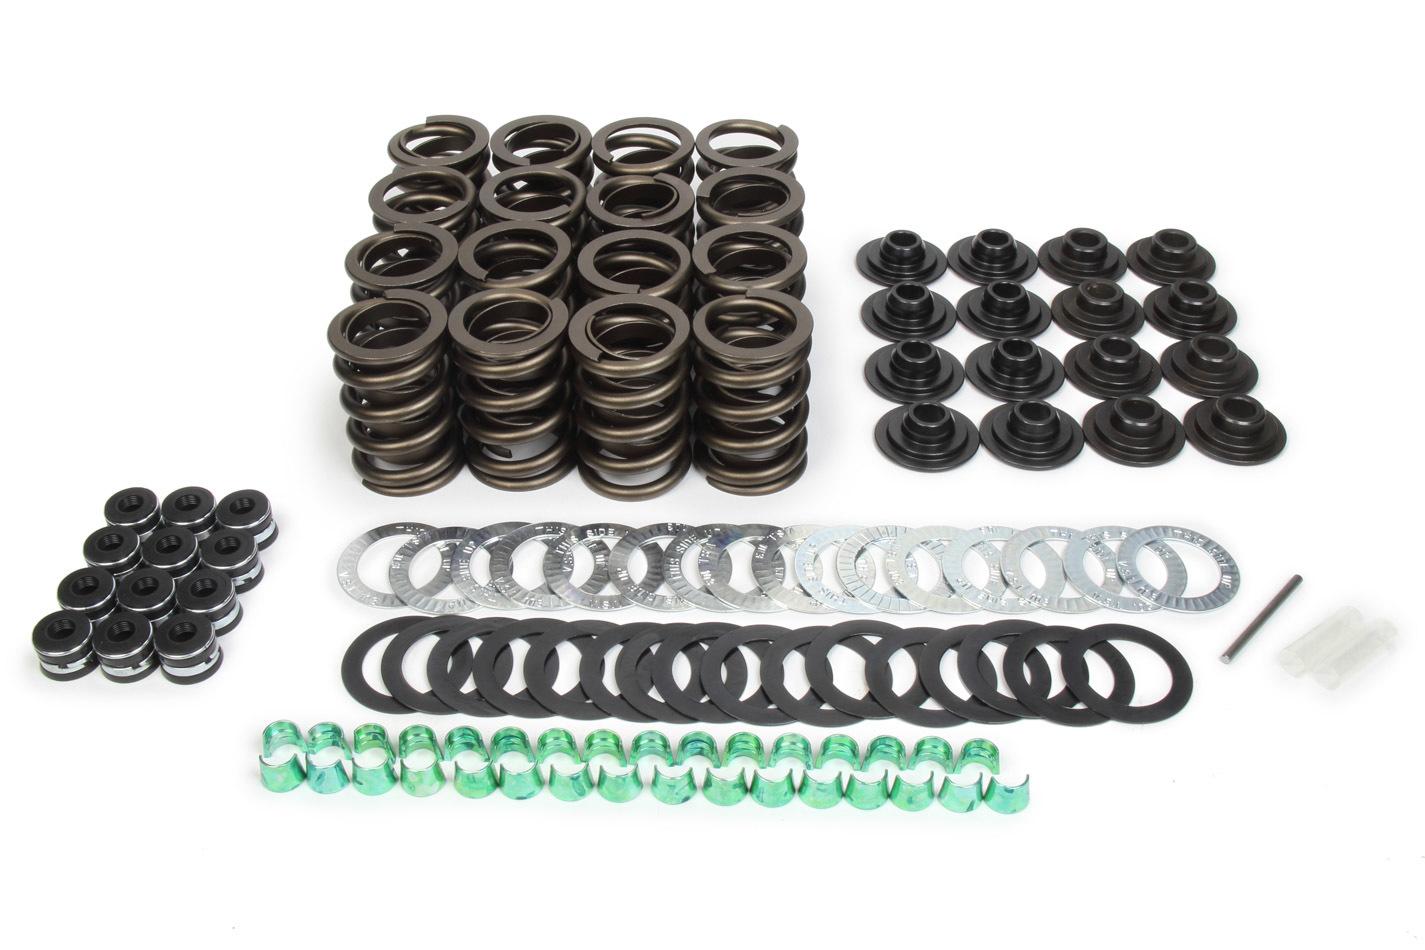 Trick Flow TFS-2500100 Valve Spring Beehive Conversion Kit, Springs / Retainers / Locks, Small Block Ford, Kit